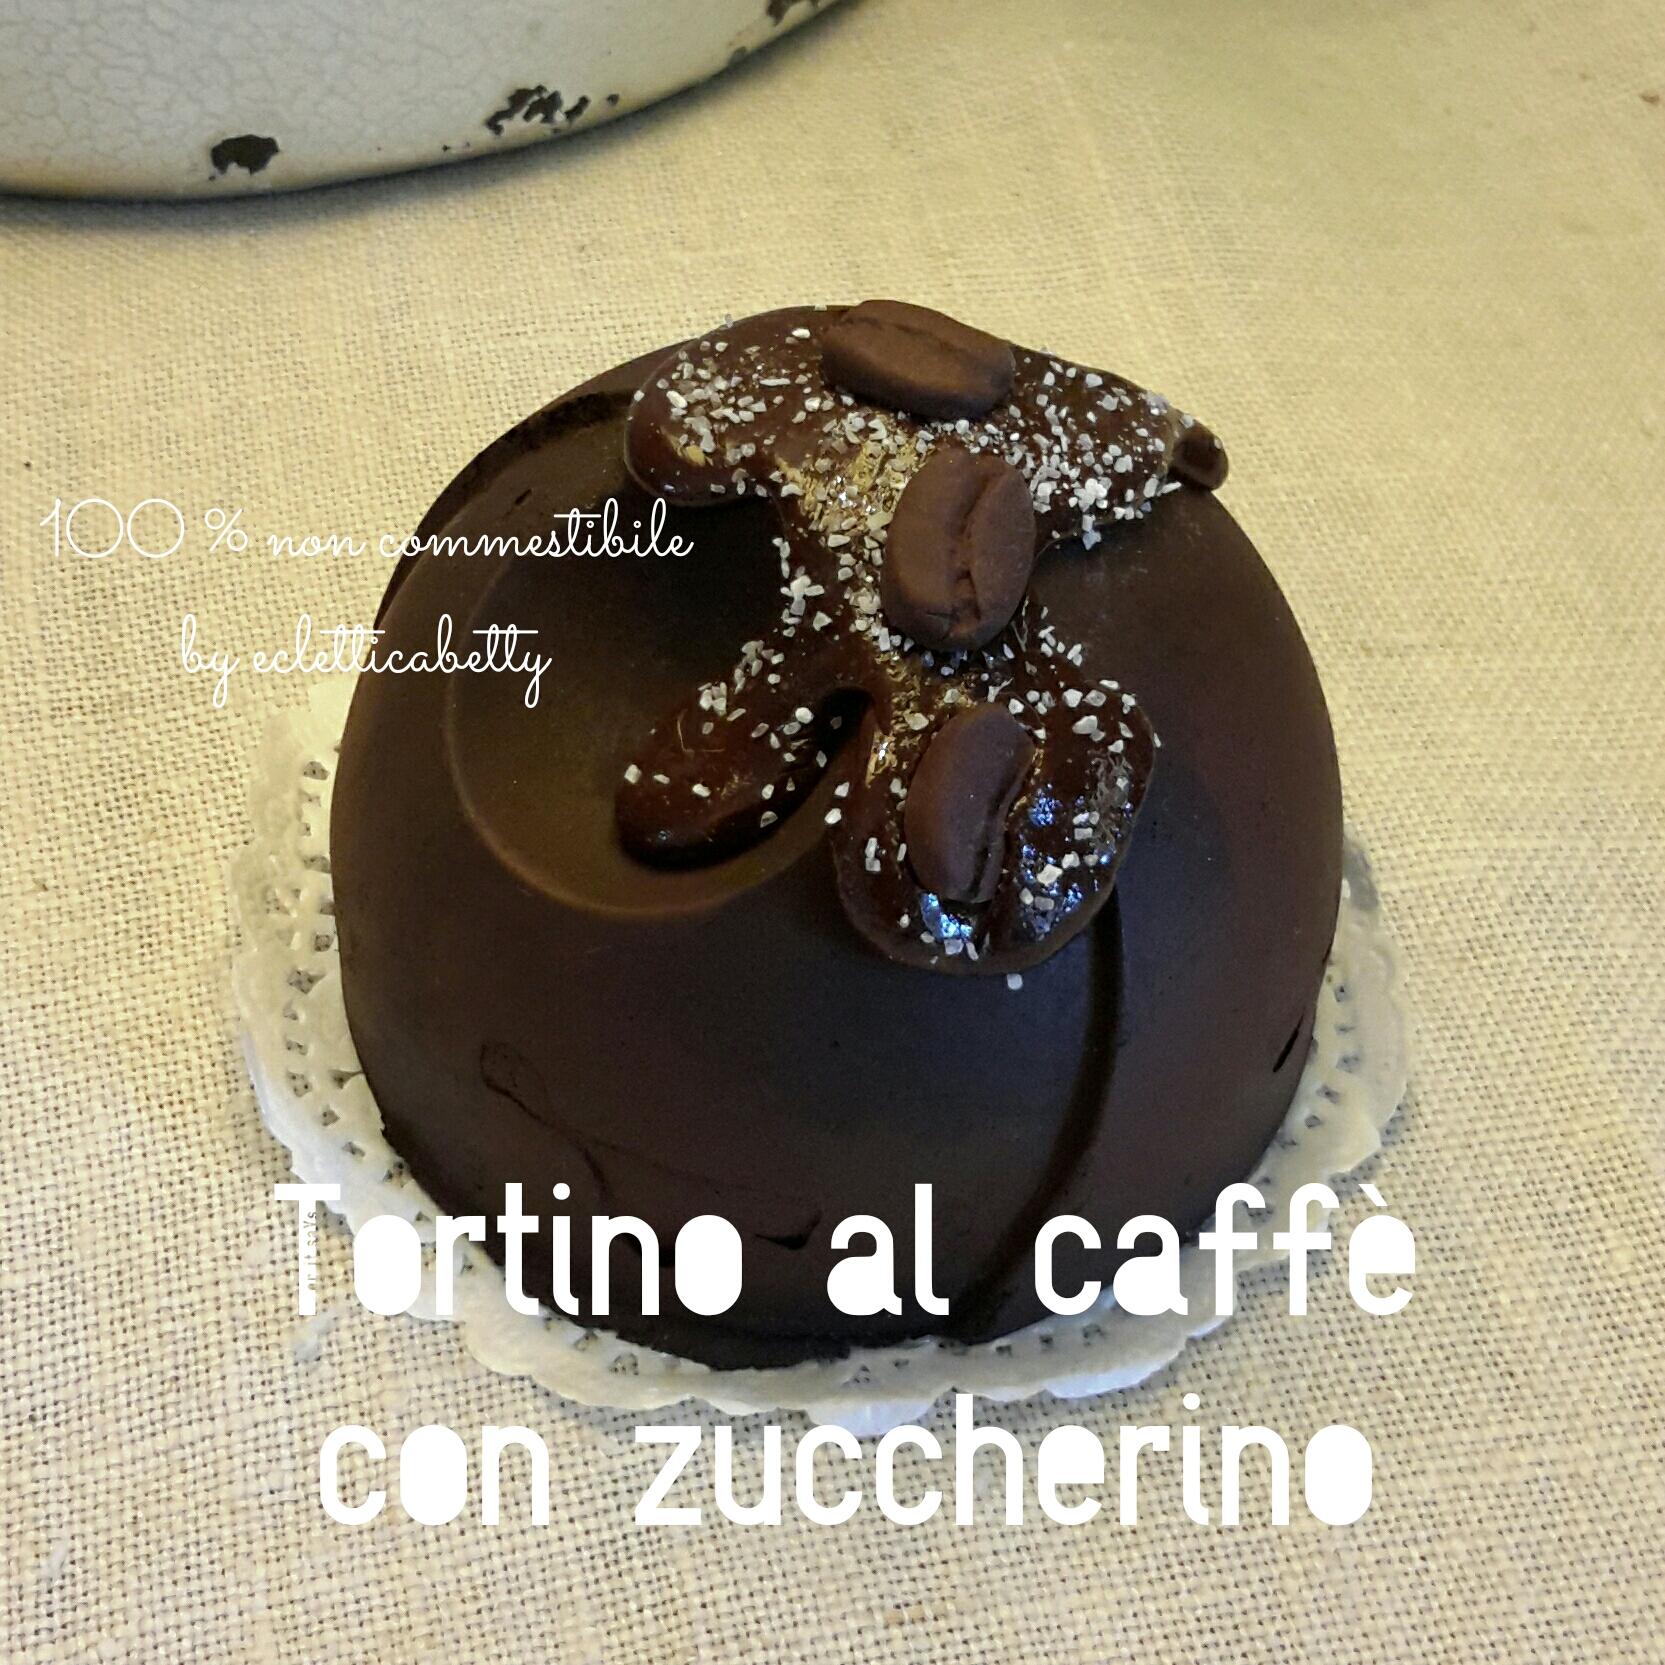 Tortino al caffè e zuccherino